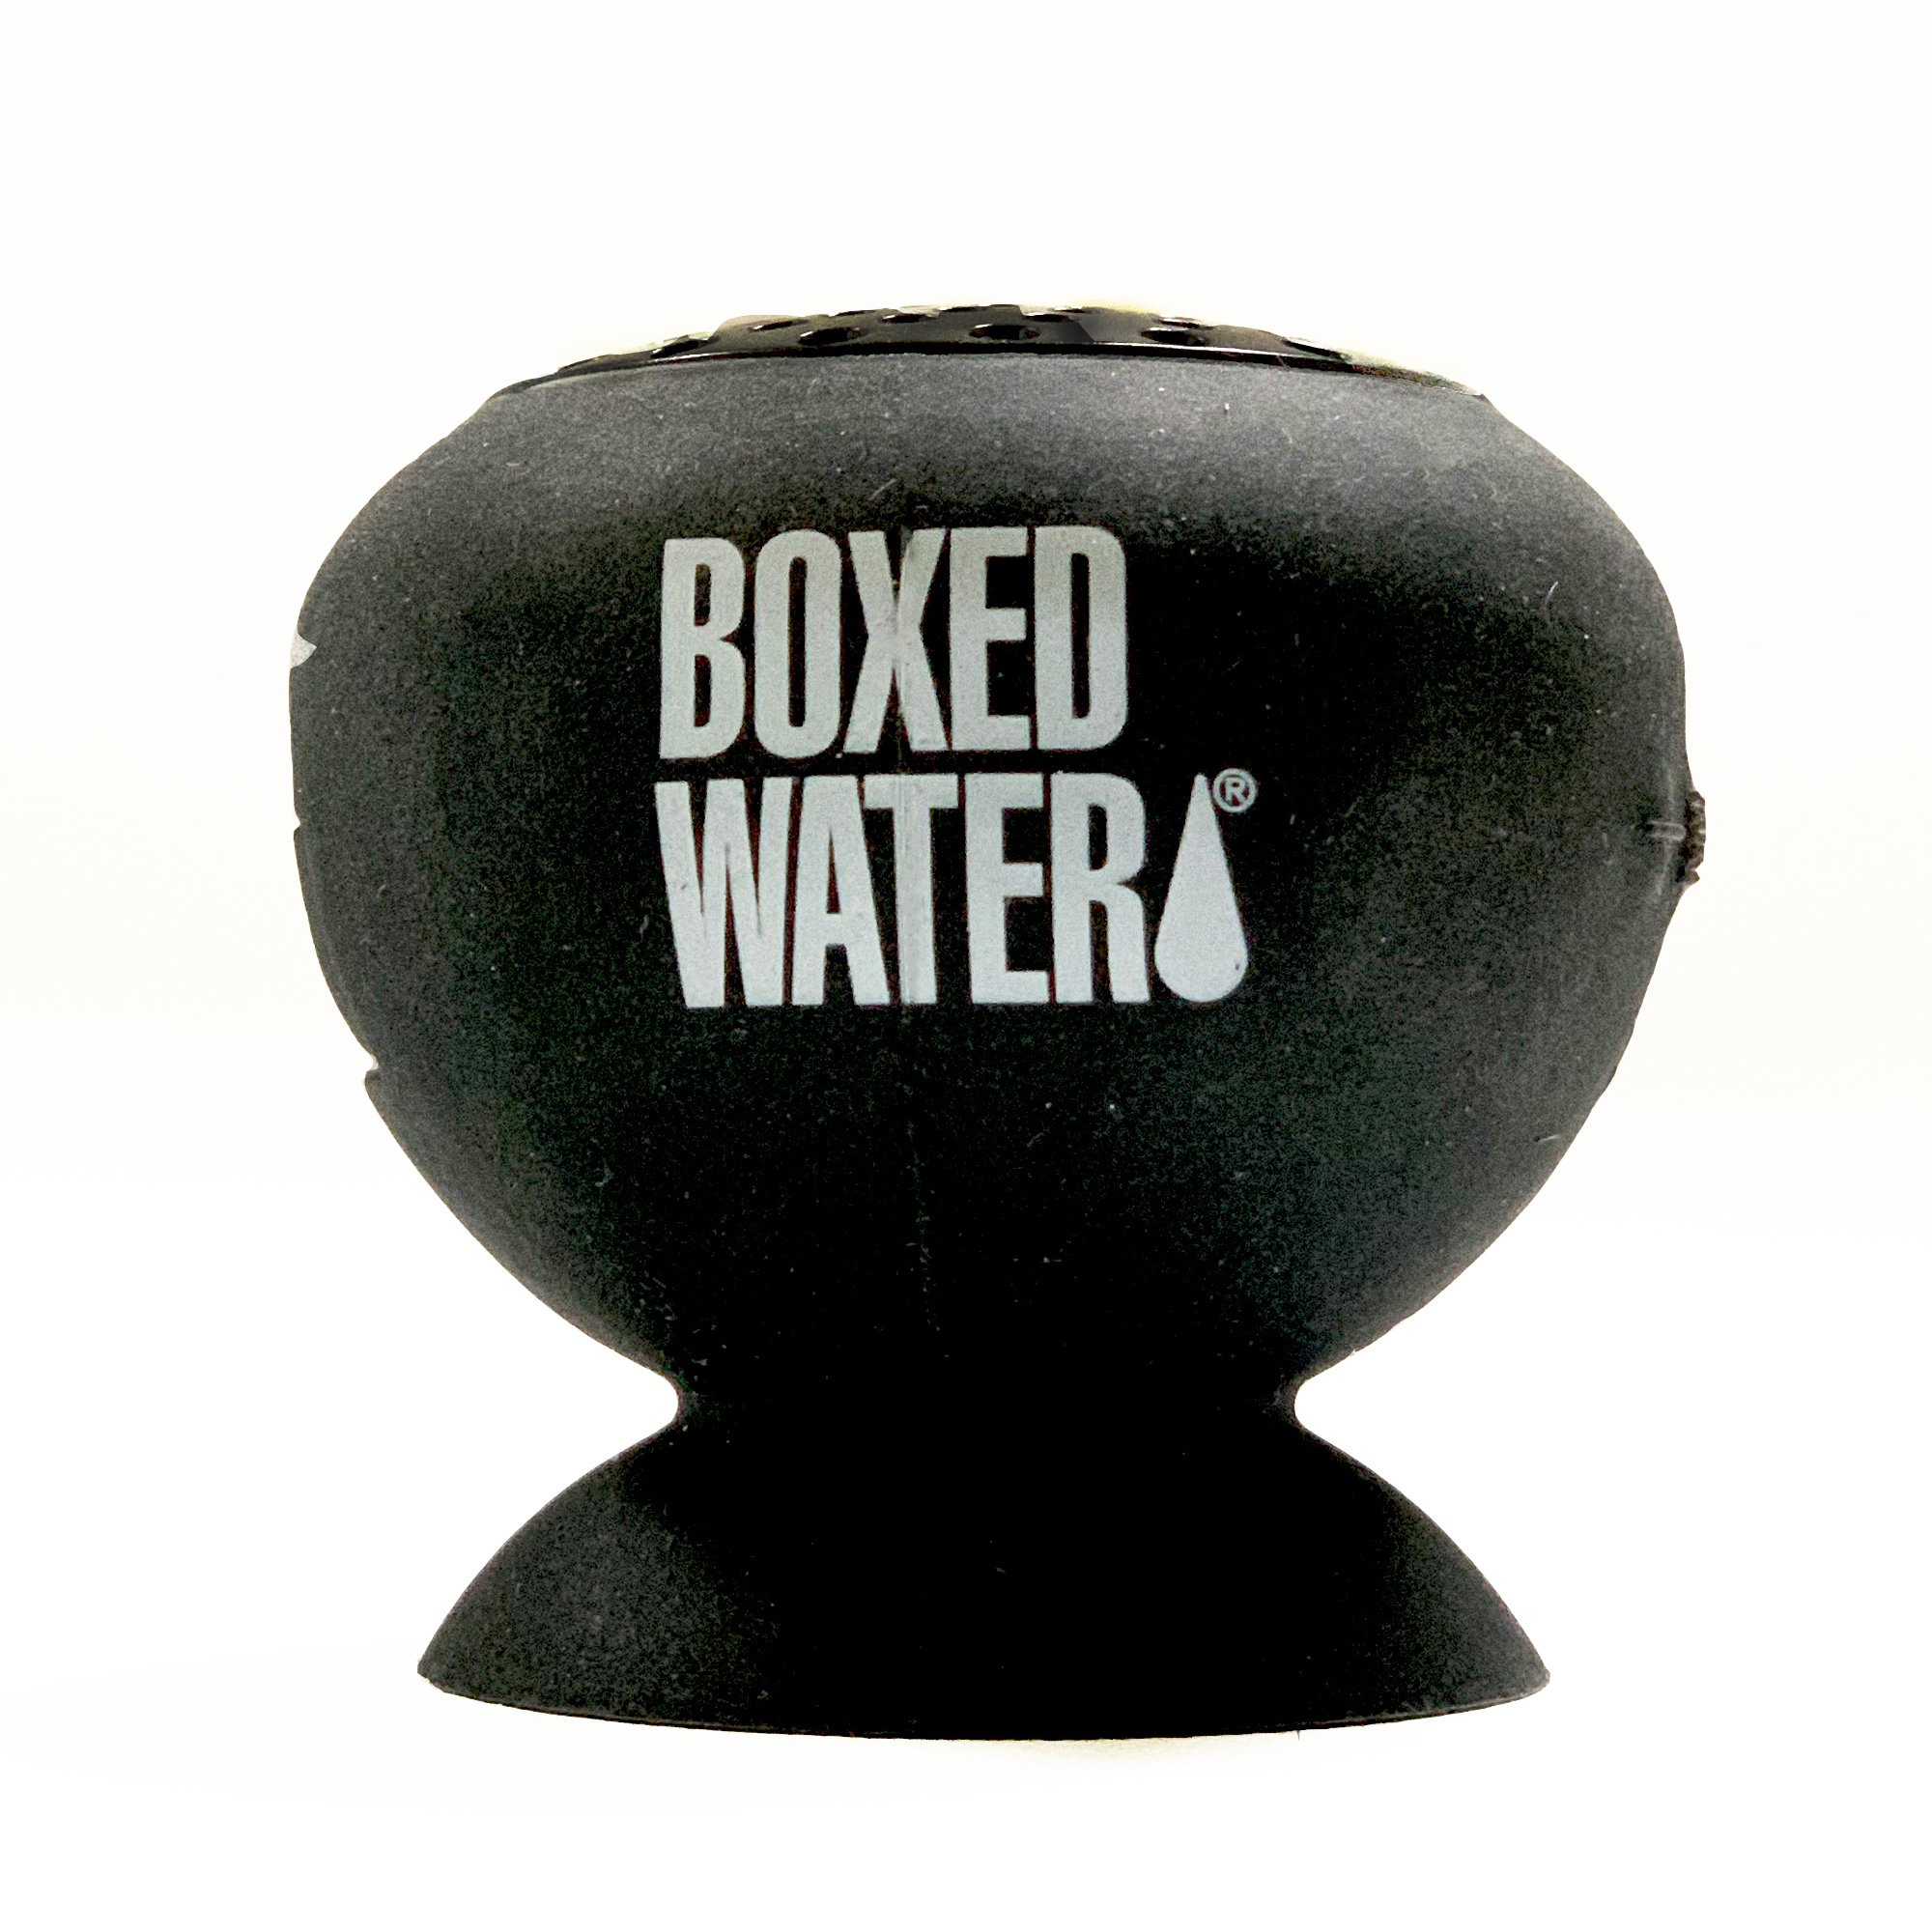 Mini Speaker Boxed Water